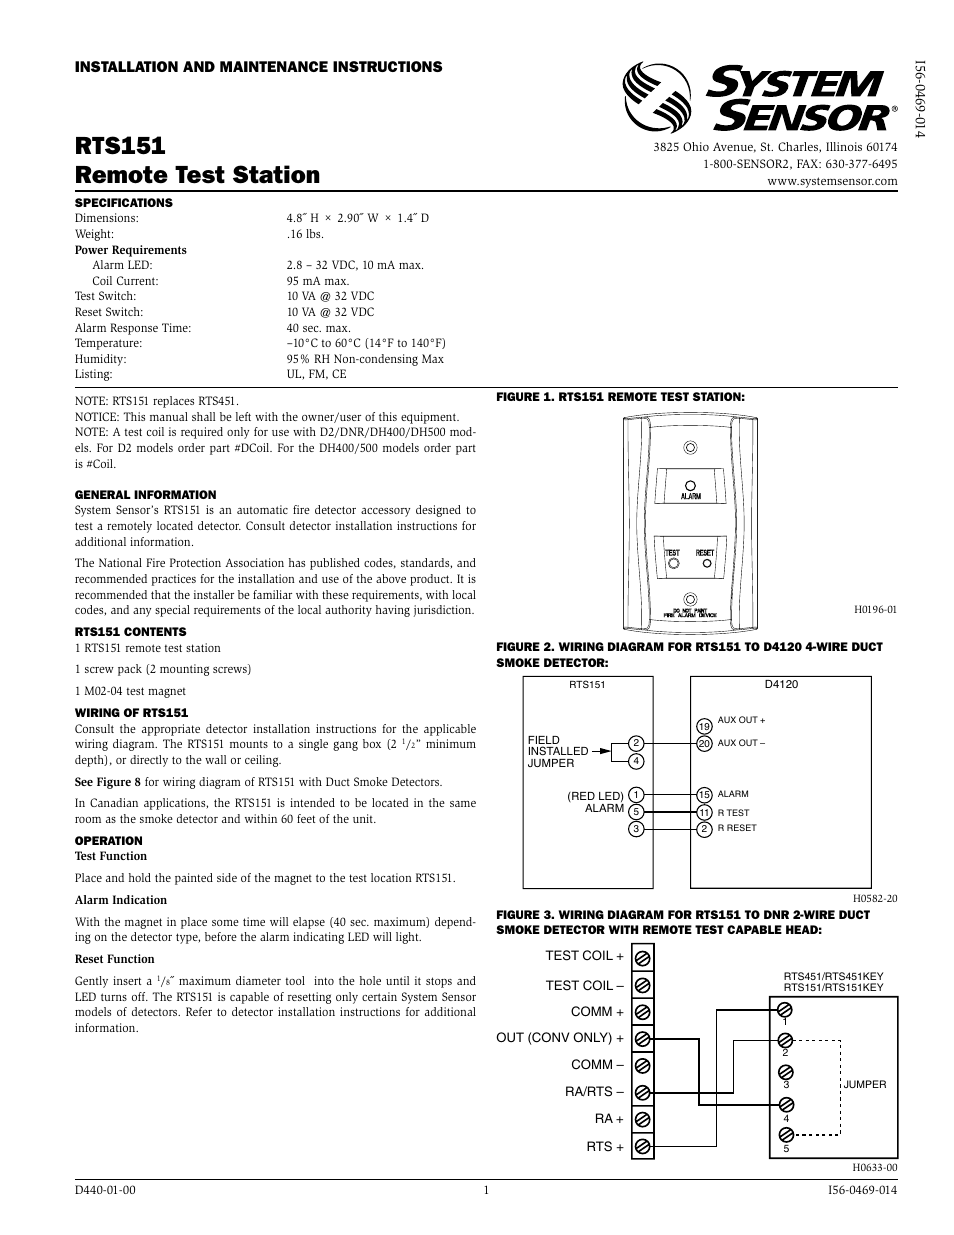 hight resolution of rts451 wiring diagram 21 wiring diagram images wiring maf sensor wiring diagram crankshaft position sensor diagram